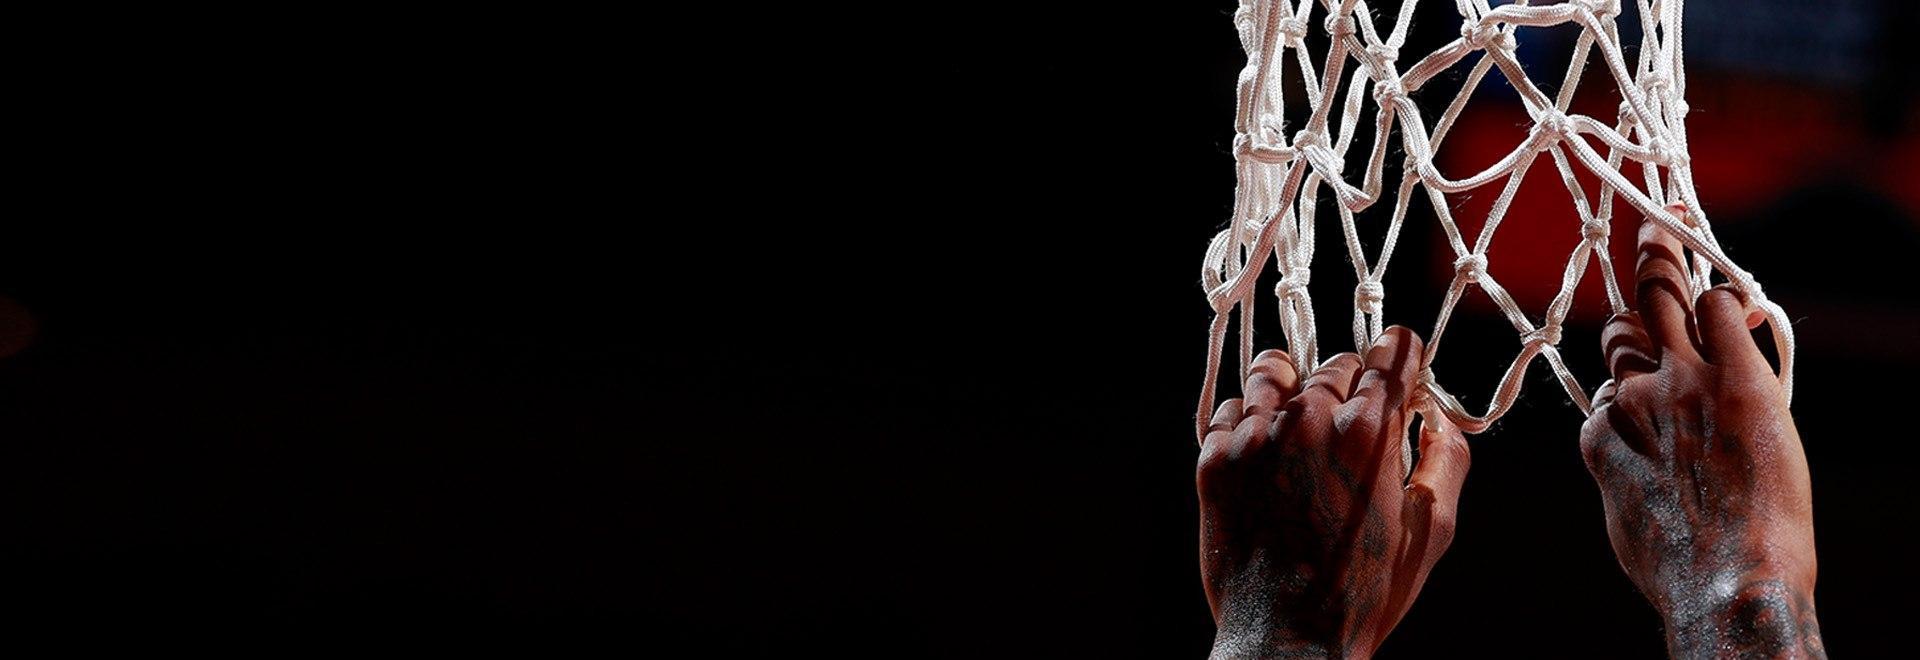 Kevin Durant - Derrick Jones Jr. Round 1